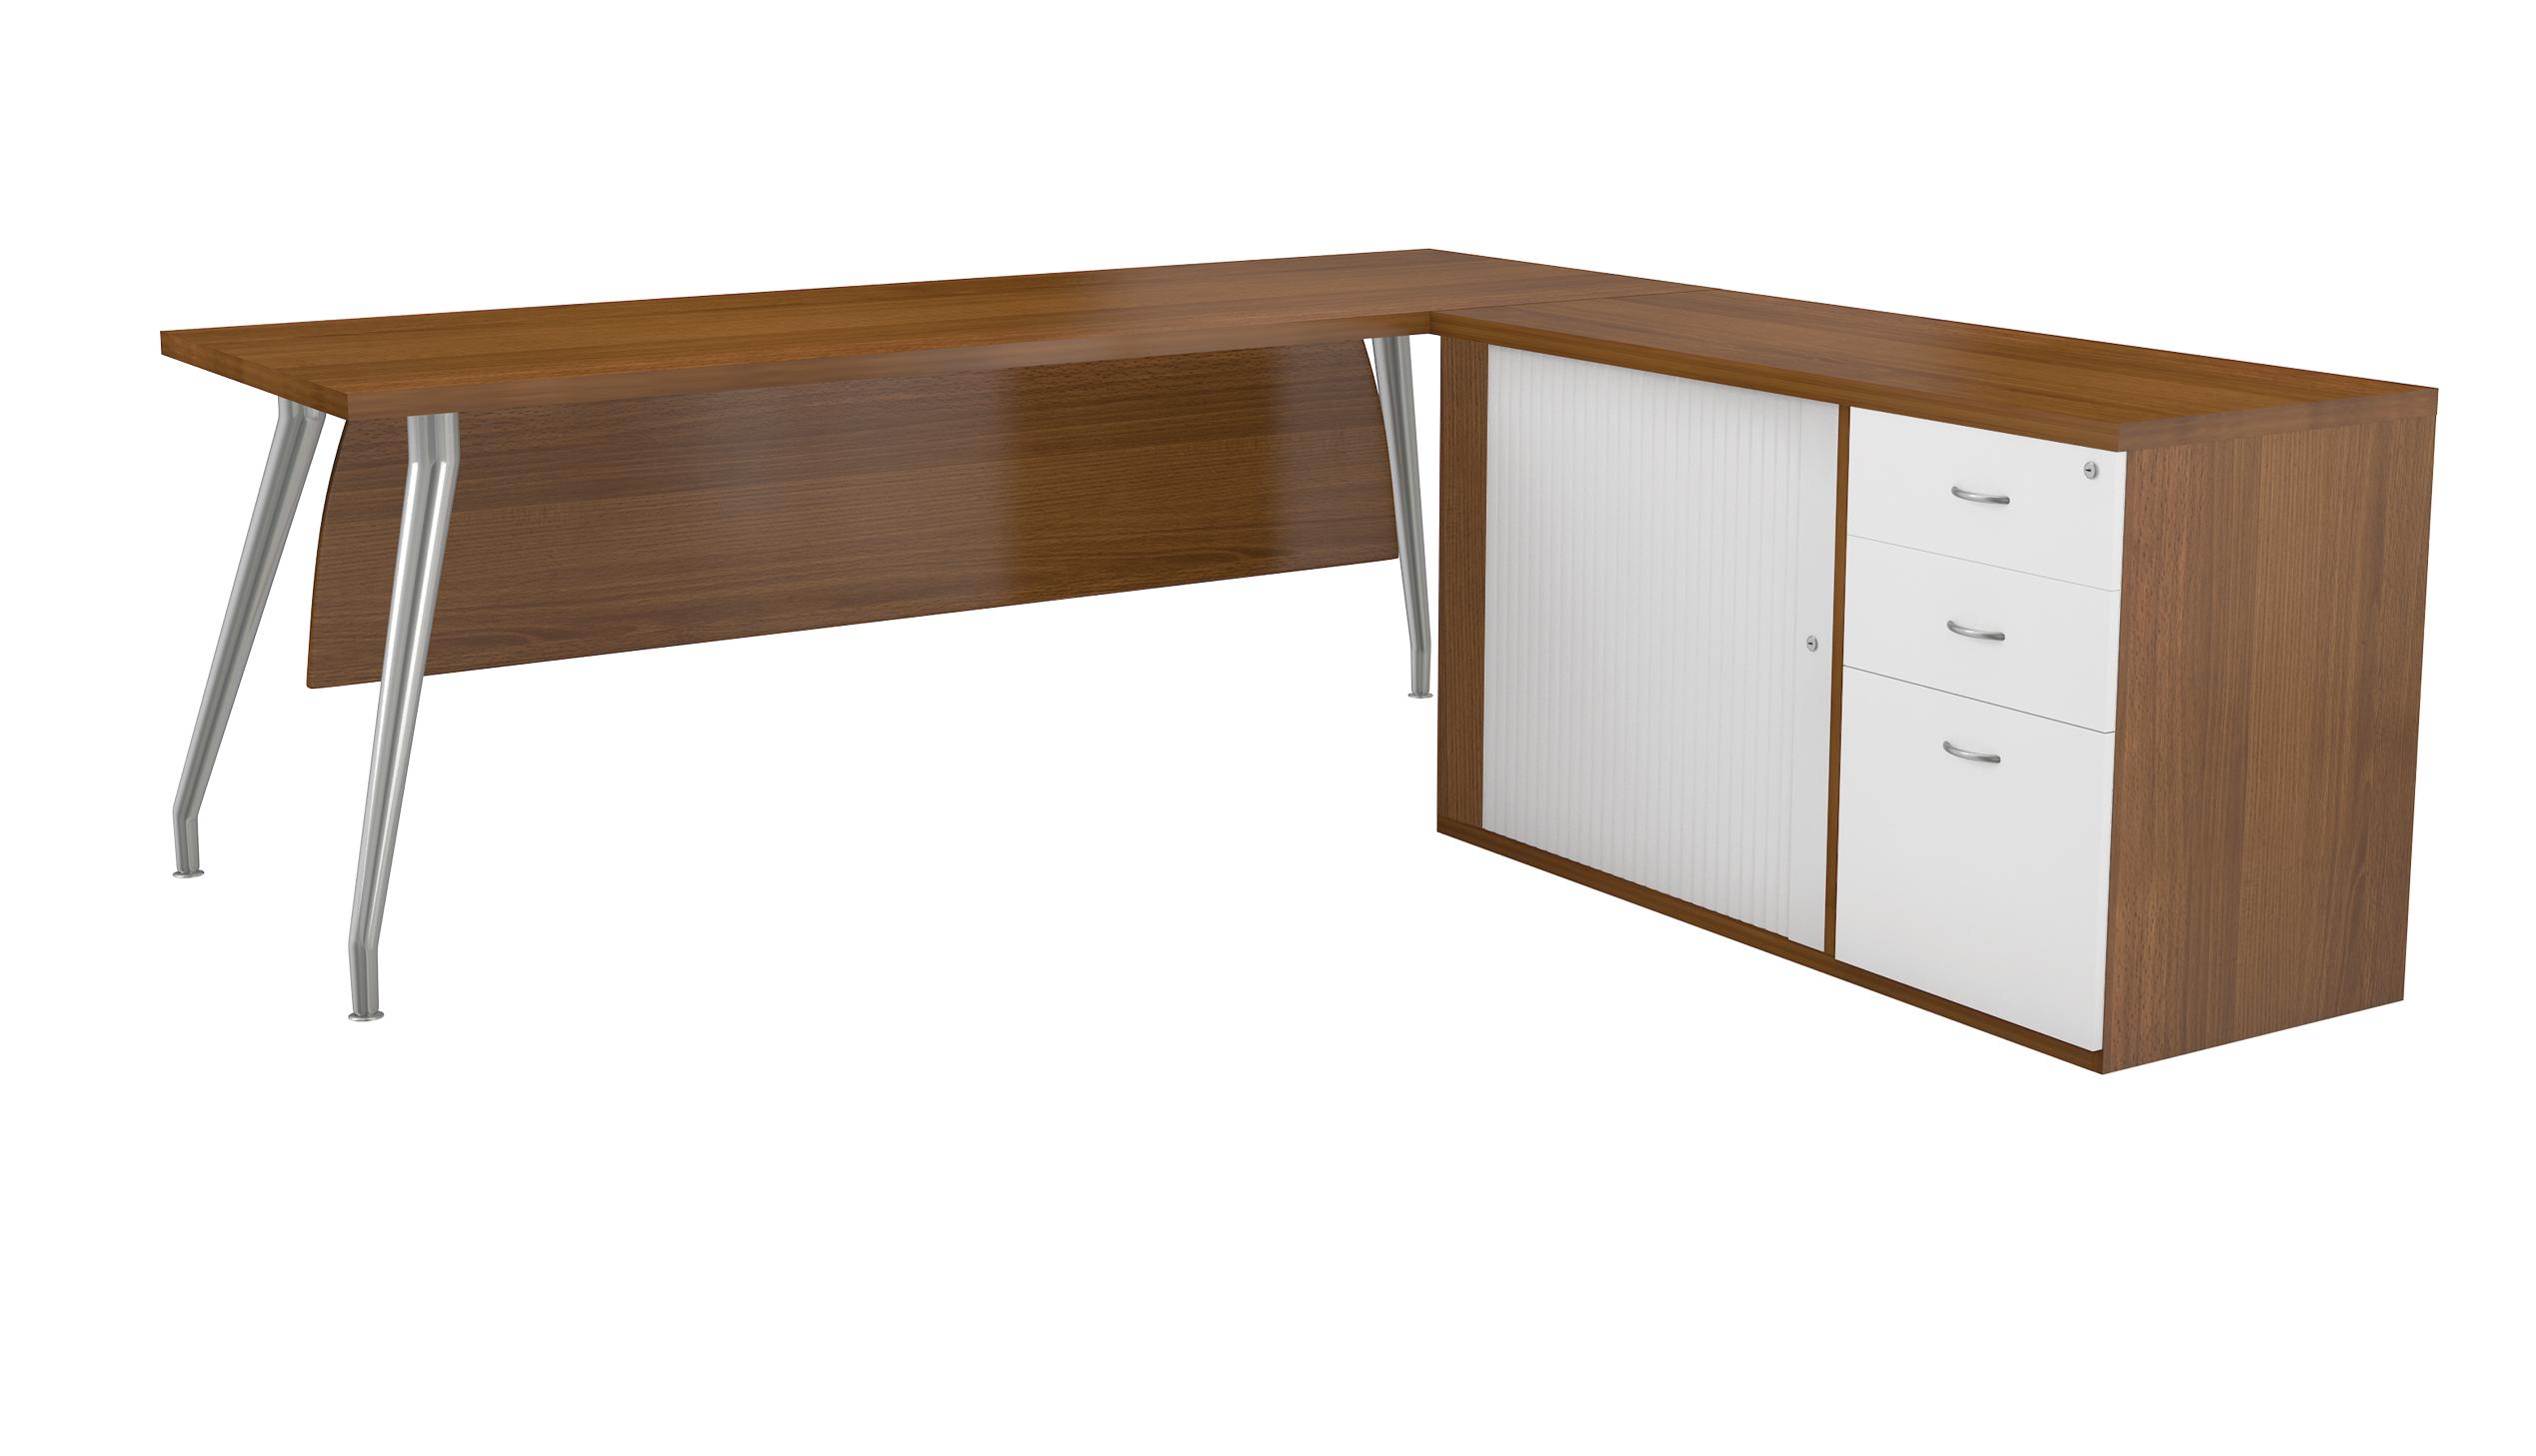 Desk Range With Curved Chrome Legs